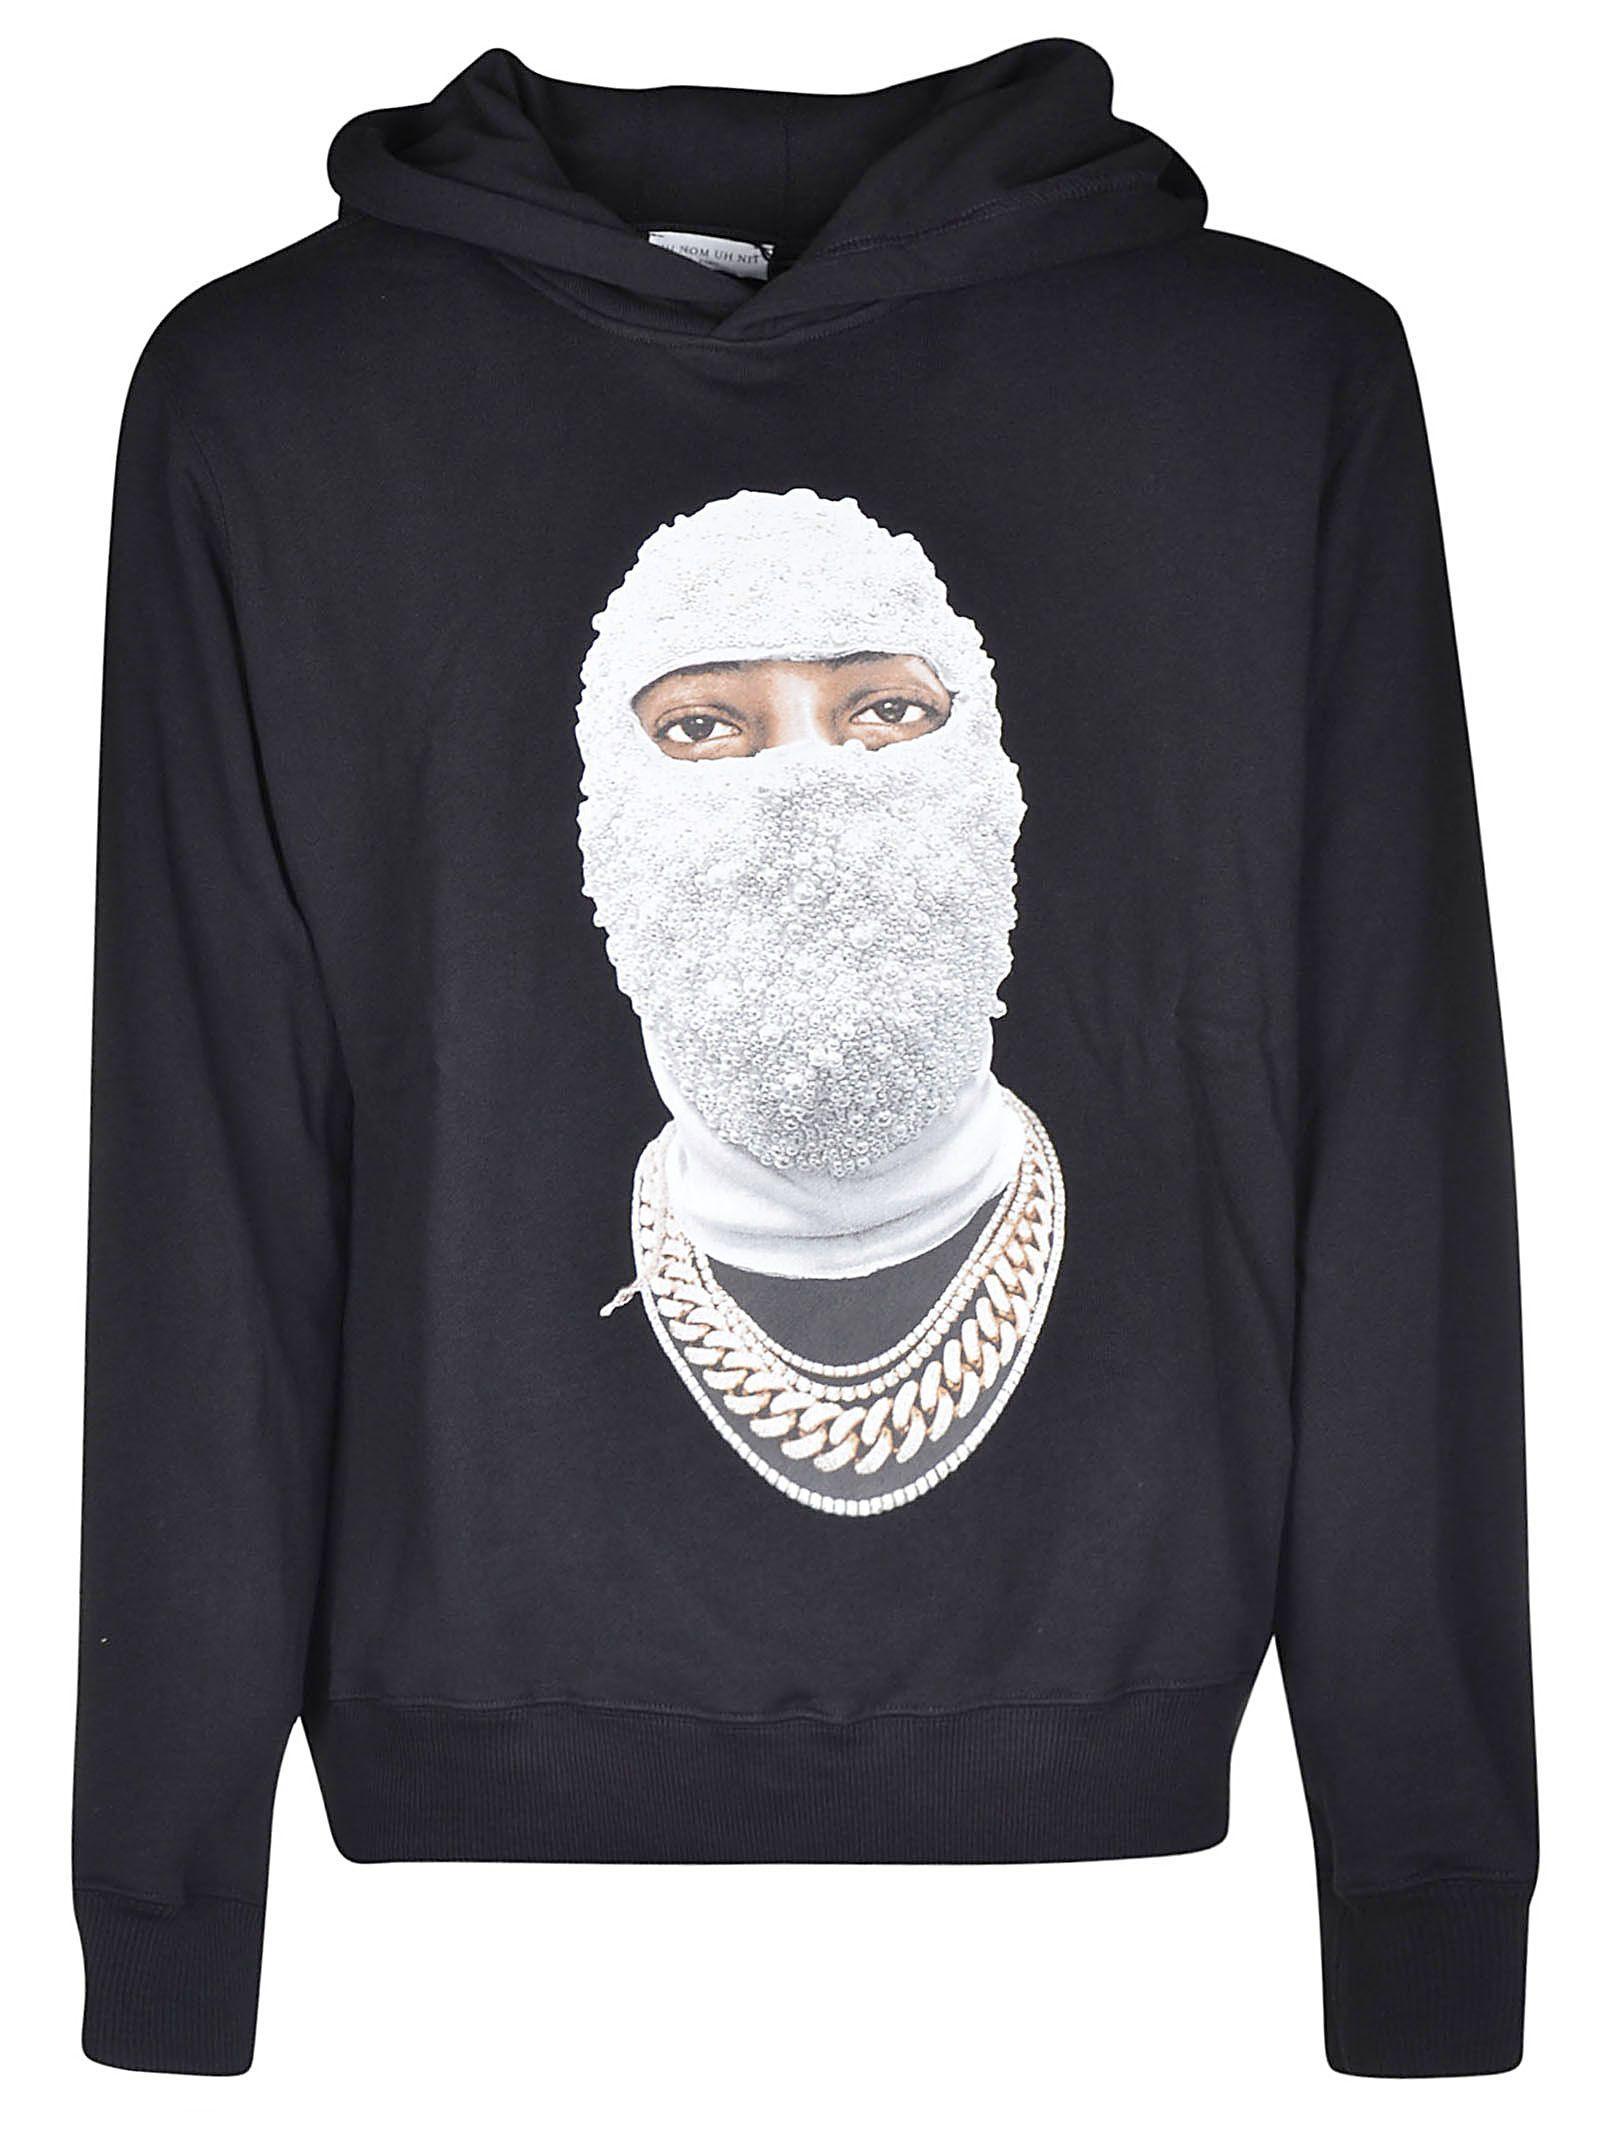 Ih Nom Uh Nit Ih Nom Uh Nit Future Face Hoodie Ihnomuhnit Cloth Printed Sweatshirts Sweatshirts Hoodies [ 2136 x 1600 Pixel ]